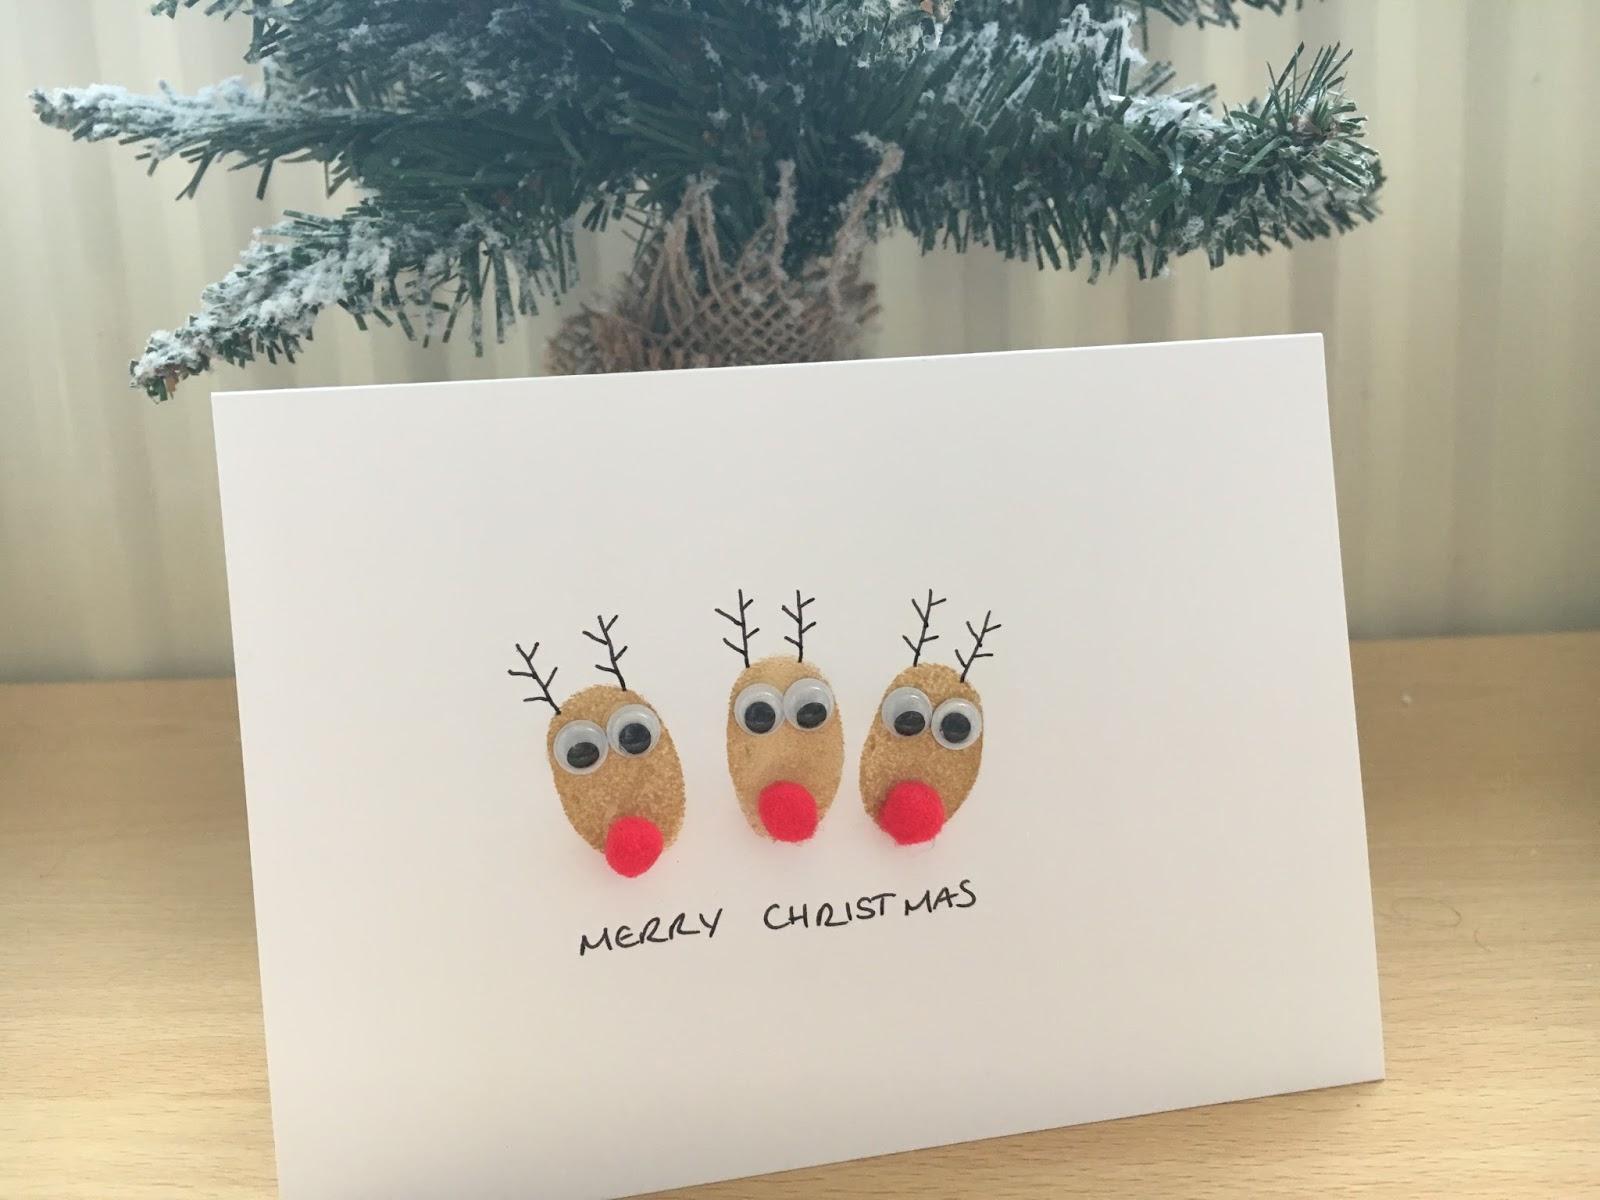 Kizzy Hearts: Easy Handmade Christmas Cards